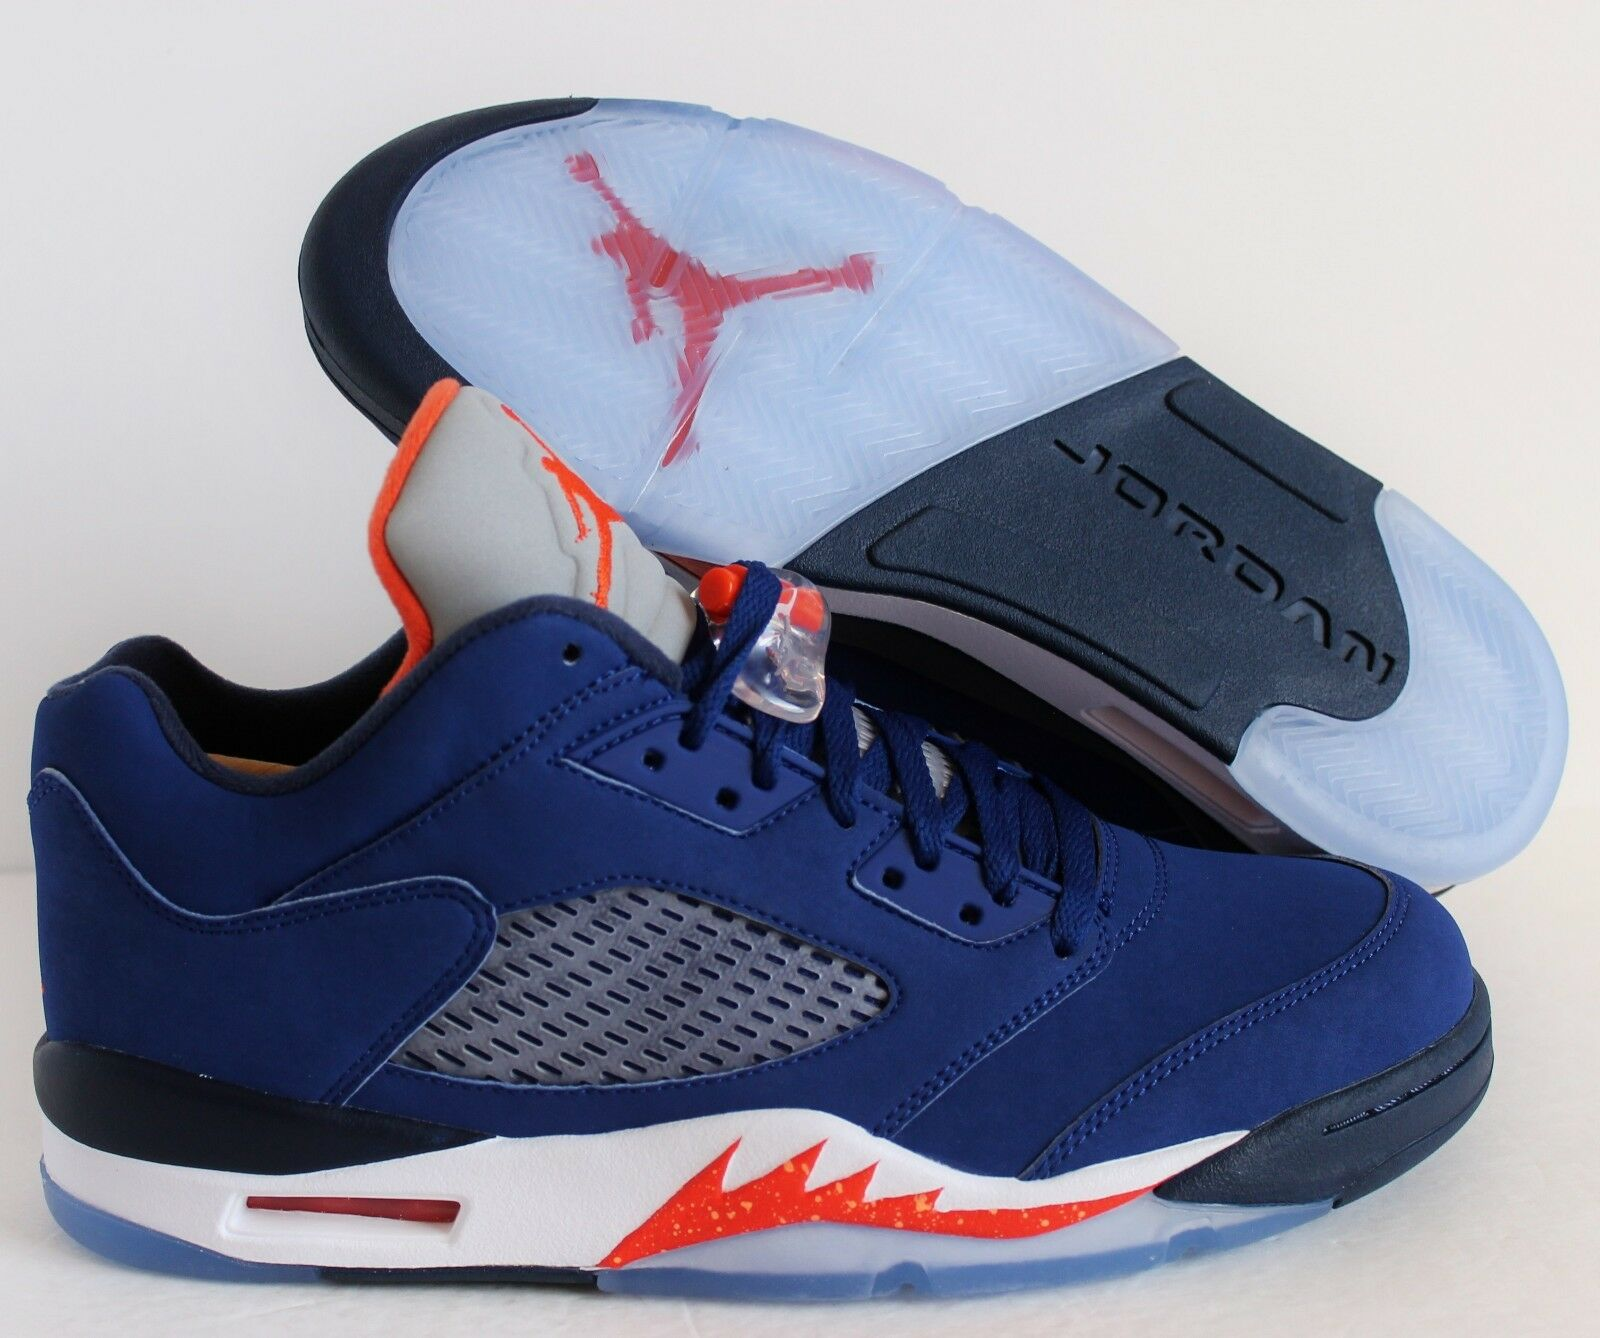 Nike Air Jordan 5 V Retro Low 'Knicks' Royal Blue-Orange Price reduction Comfortable and good-looking